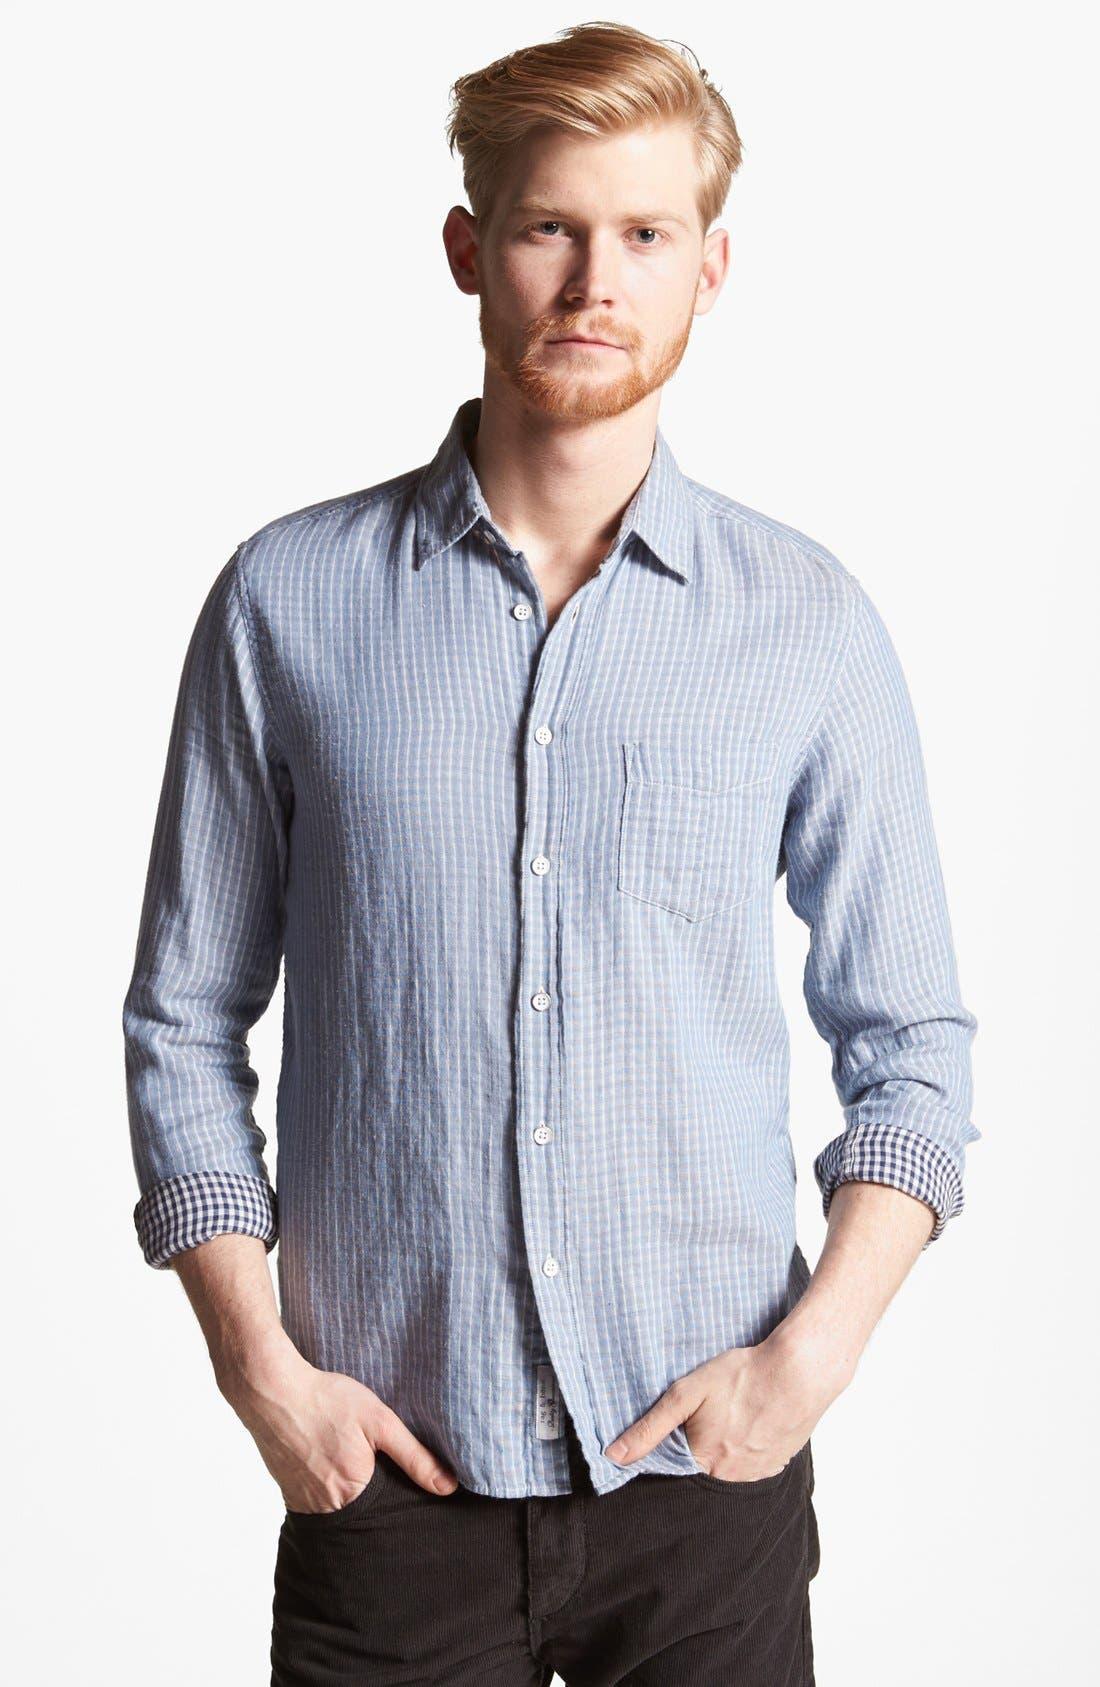 Alternate Image 1 Selected - rag & bone 'Yokohama' Double Faced Cotton Shirt